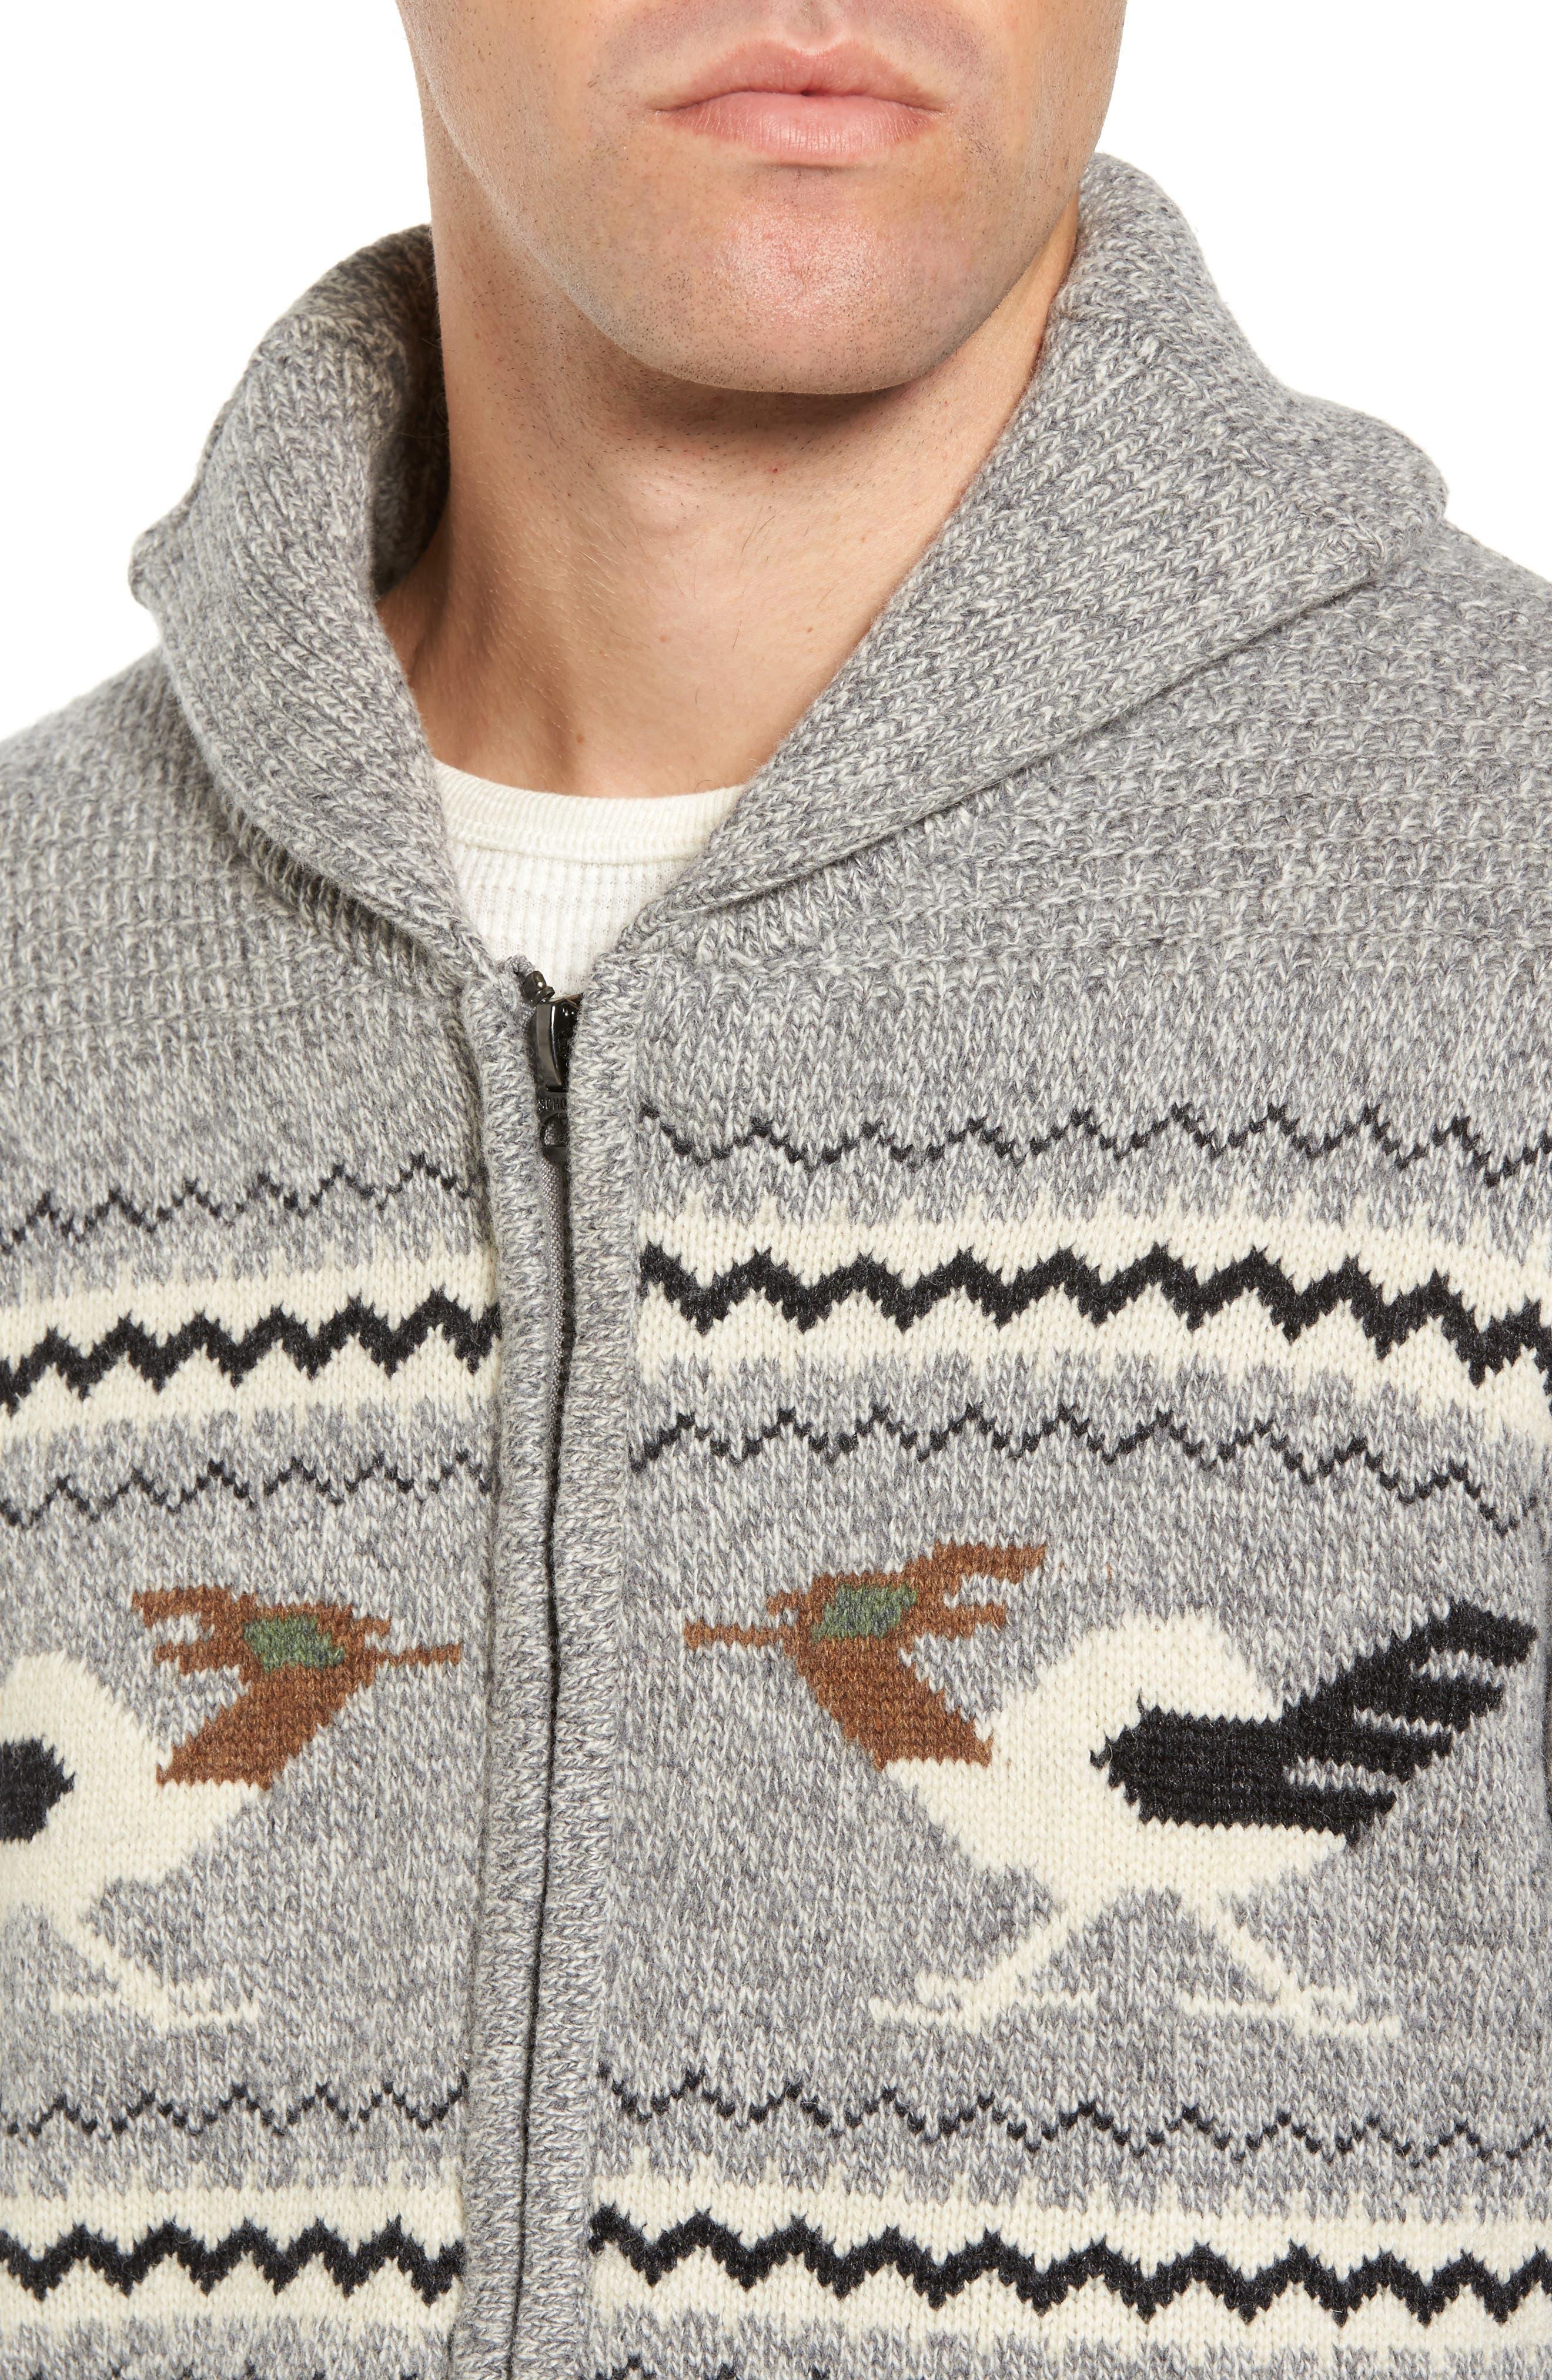 Road Runner Wool Blend Cardigan,                             Alternate thumbnail 4, color,                             050